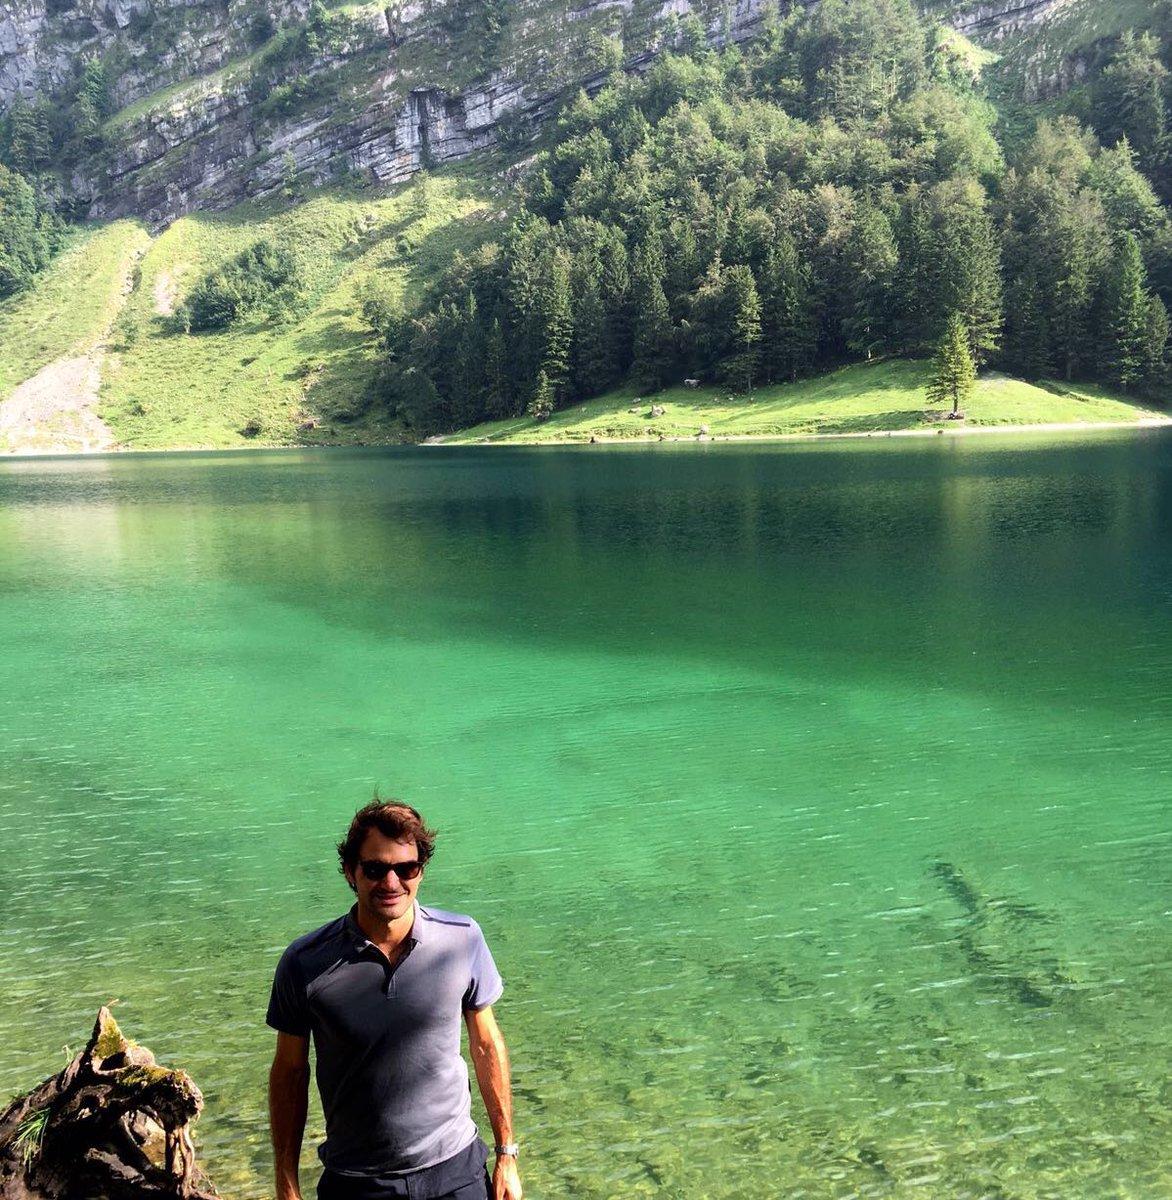 Roger Federer: Roger Federer (@rogerfederer)